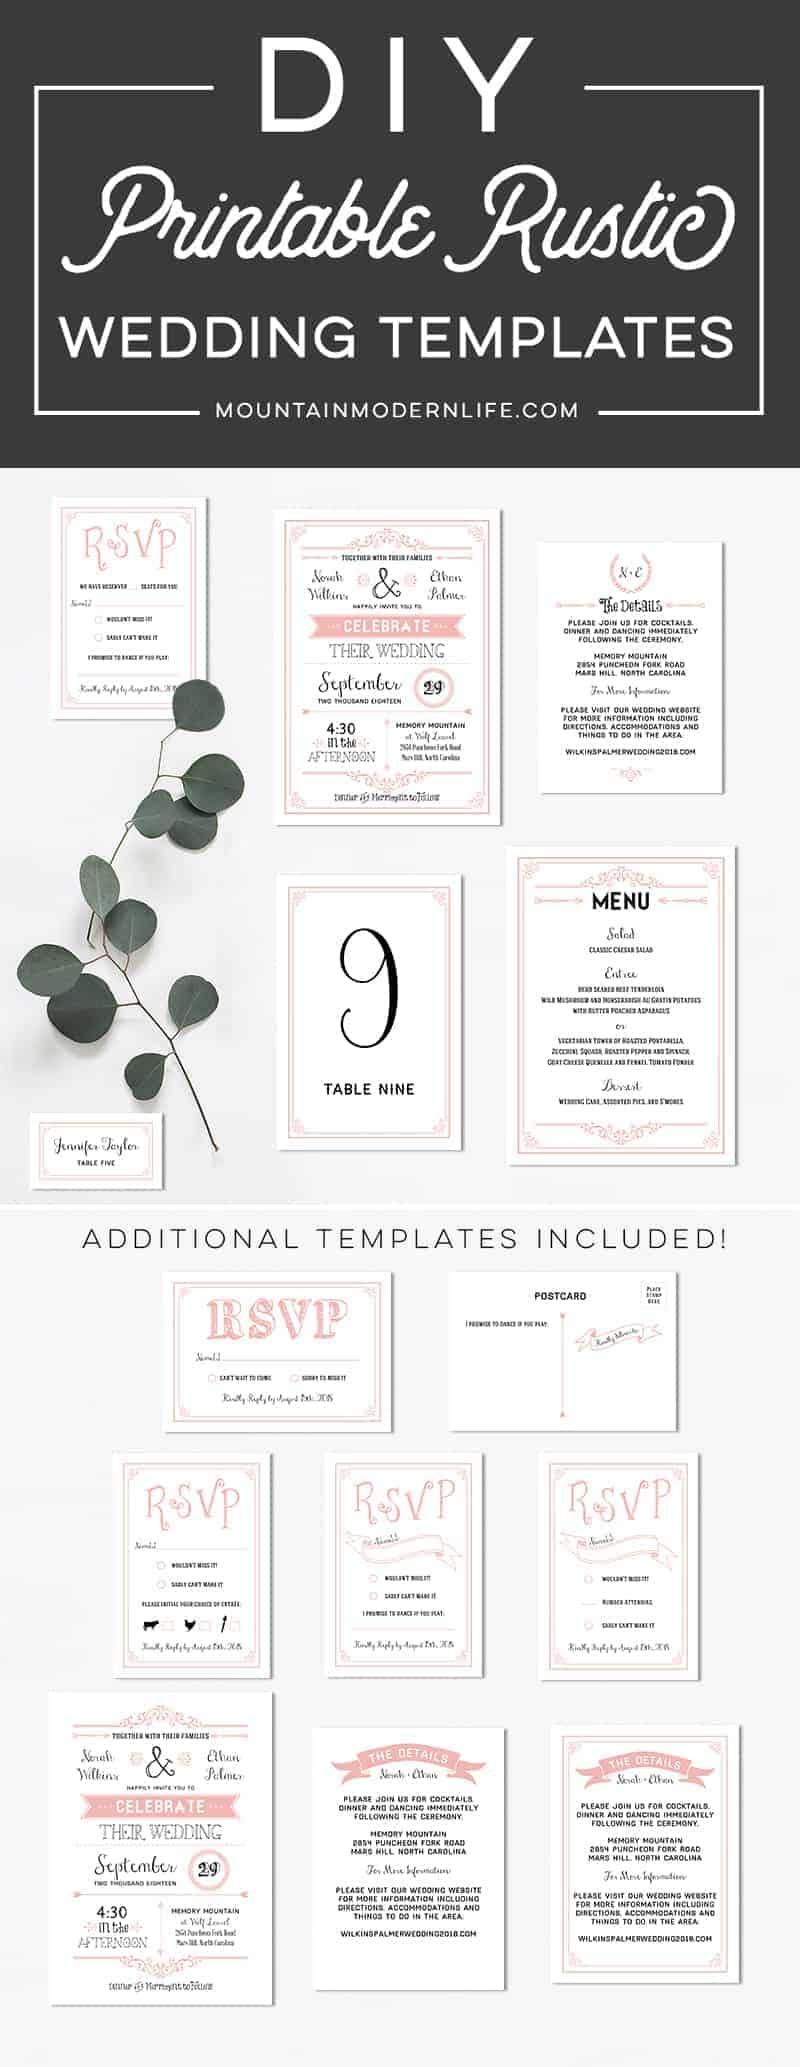 blush-pink-diy-rustic-printable-wedding-invitation-templates-mountainmodernlife.com